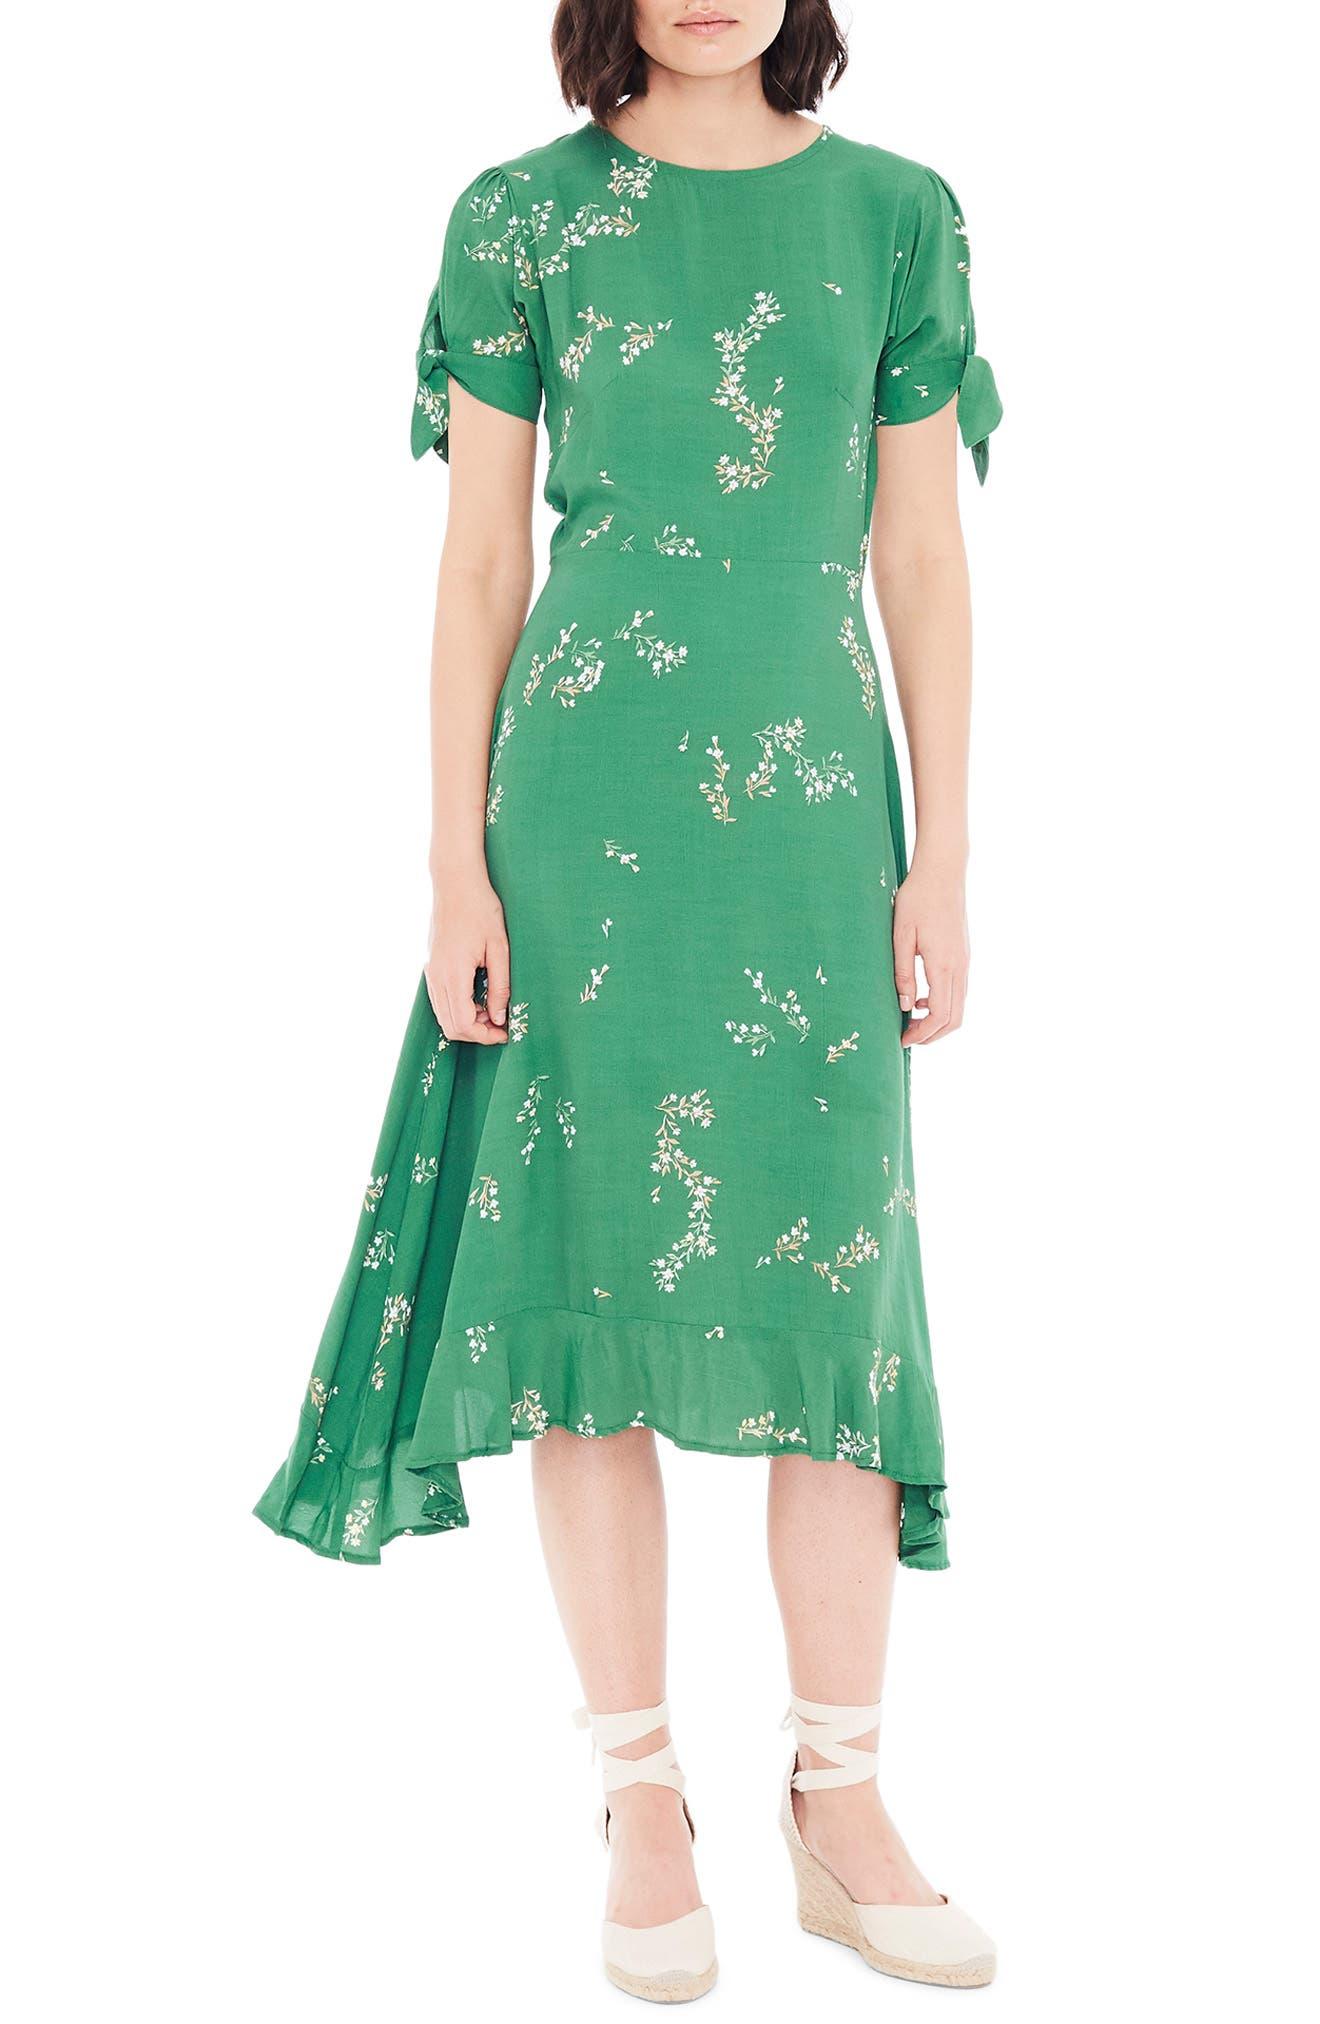 FAITHFULL THE BRAND, Emilia Floral Midi Dress, Main thumbnail 1, color, MYRTILLE FLORAL PRINT - GREEN